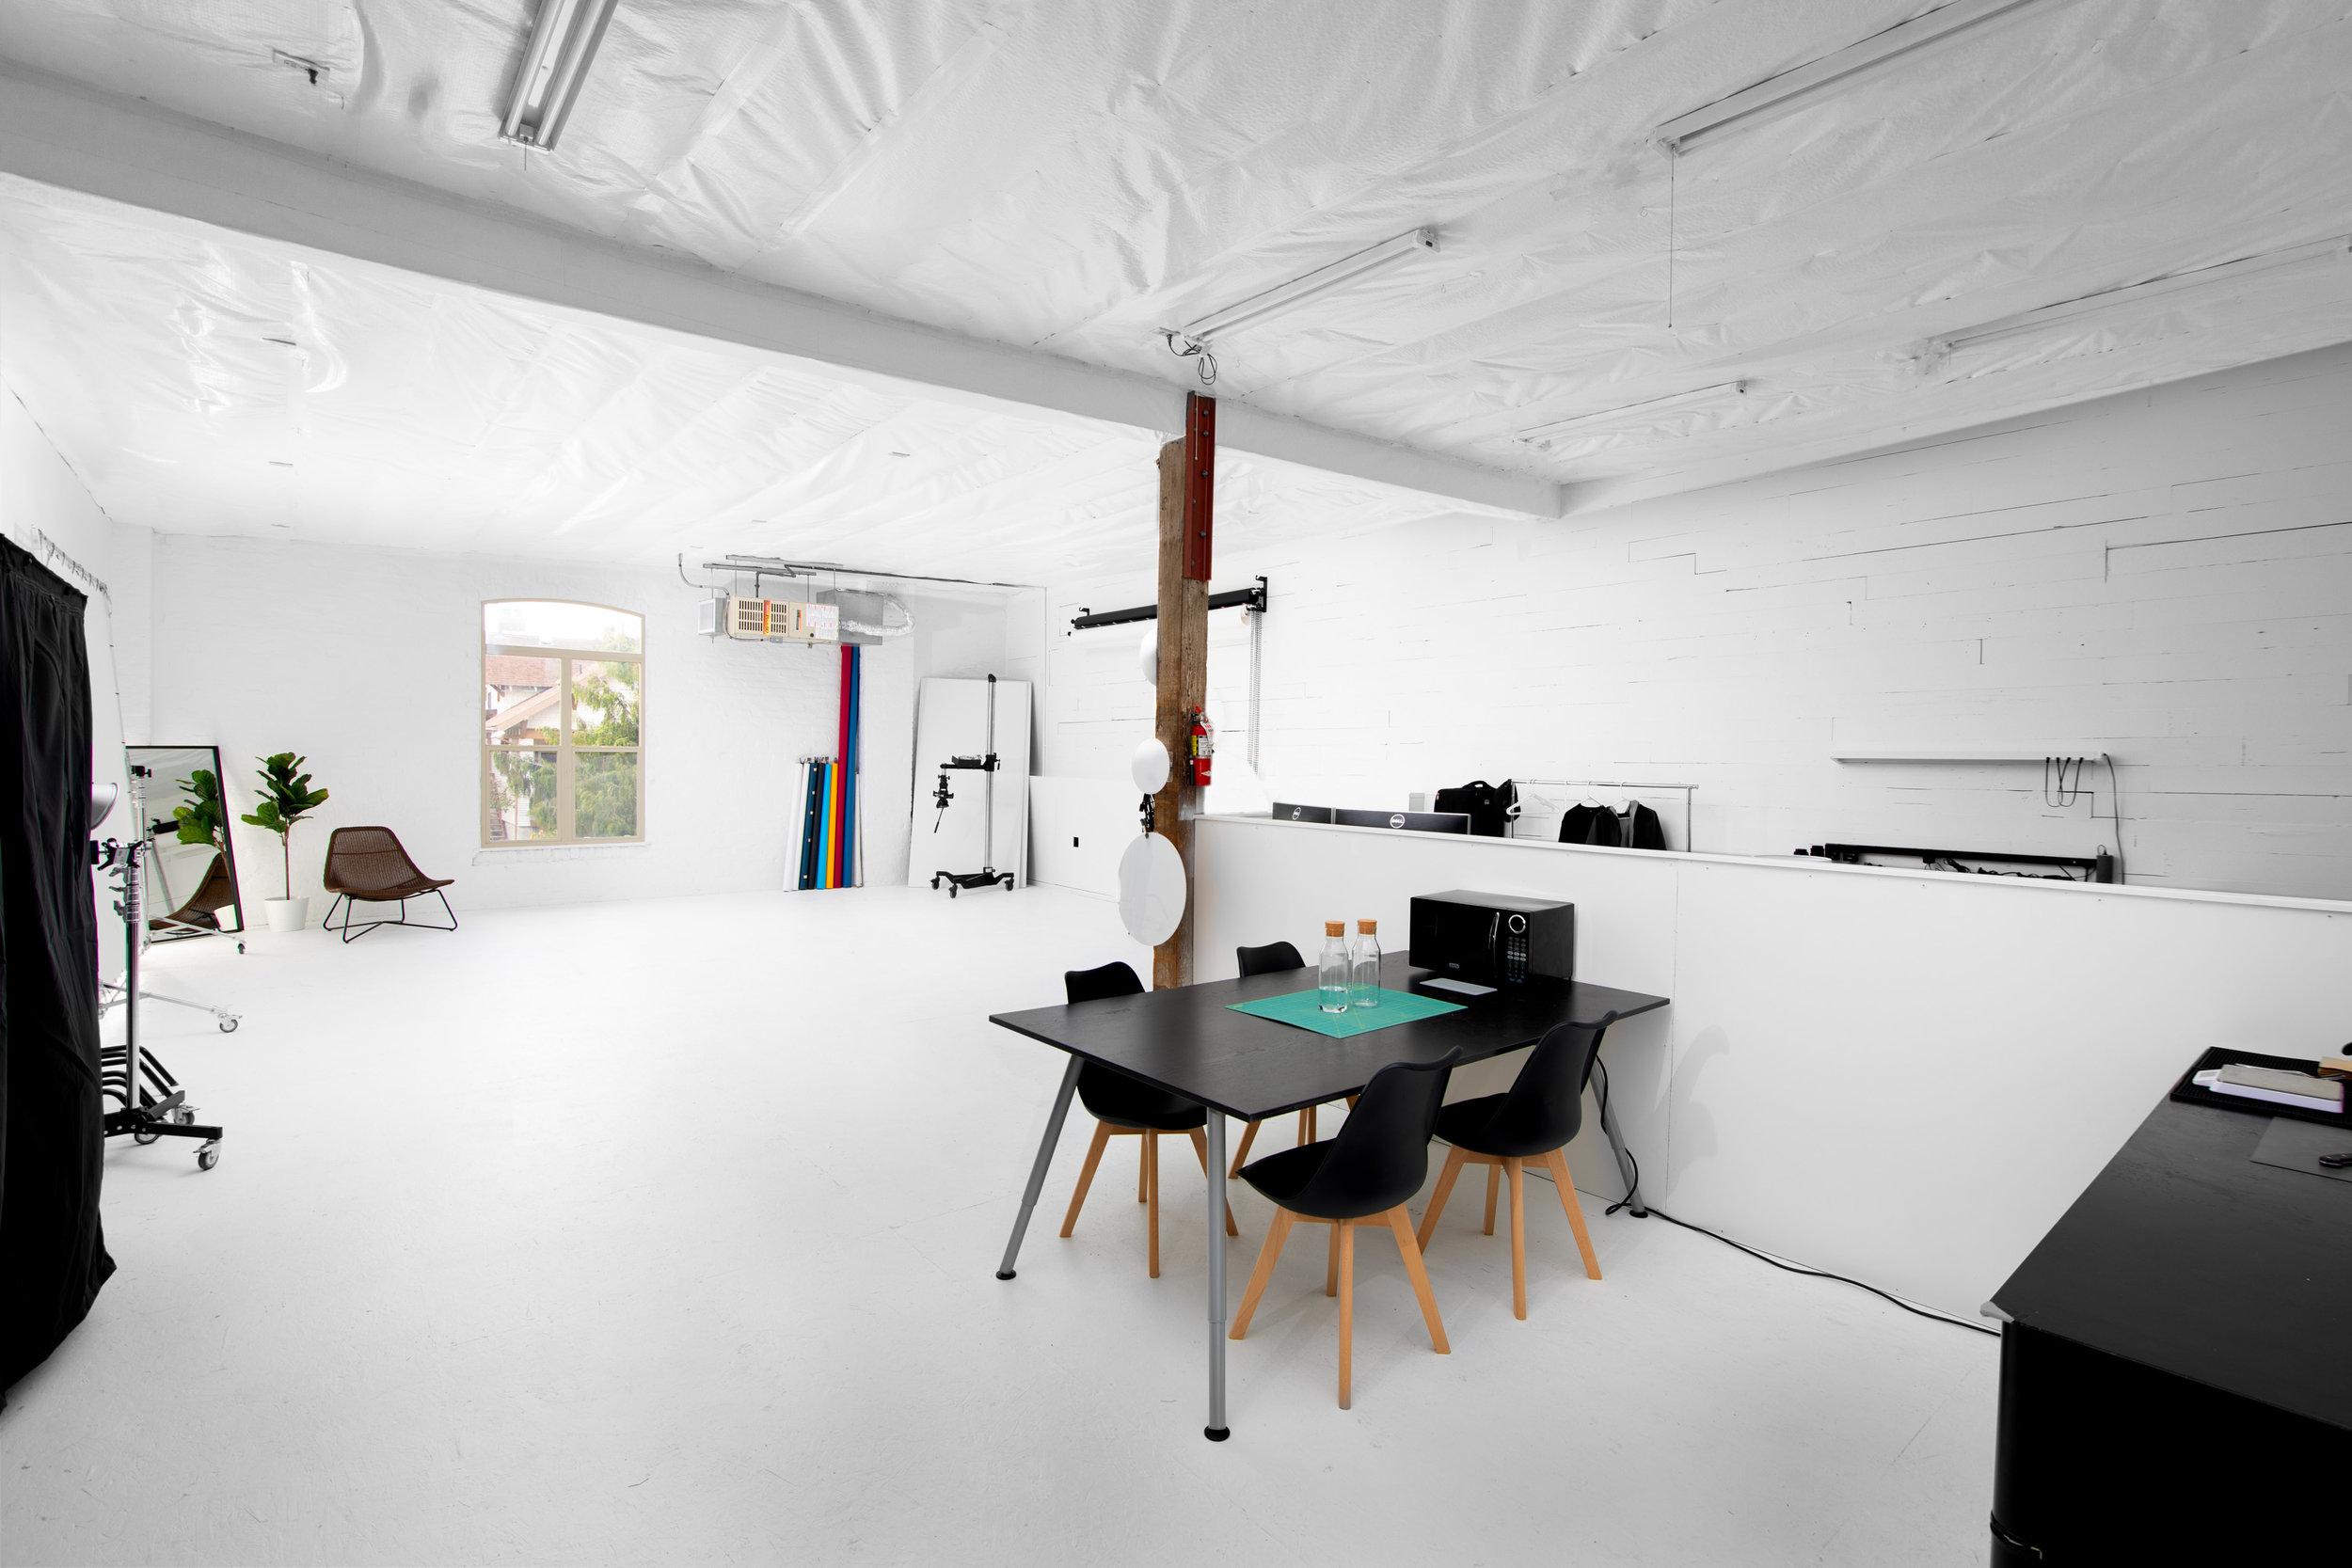 spencer wallace photo studio rental video-3.jpg